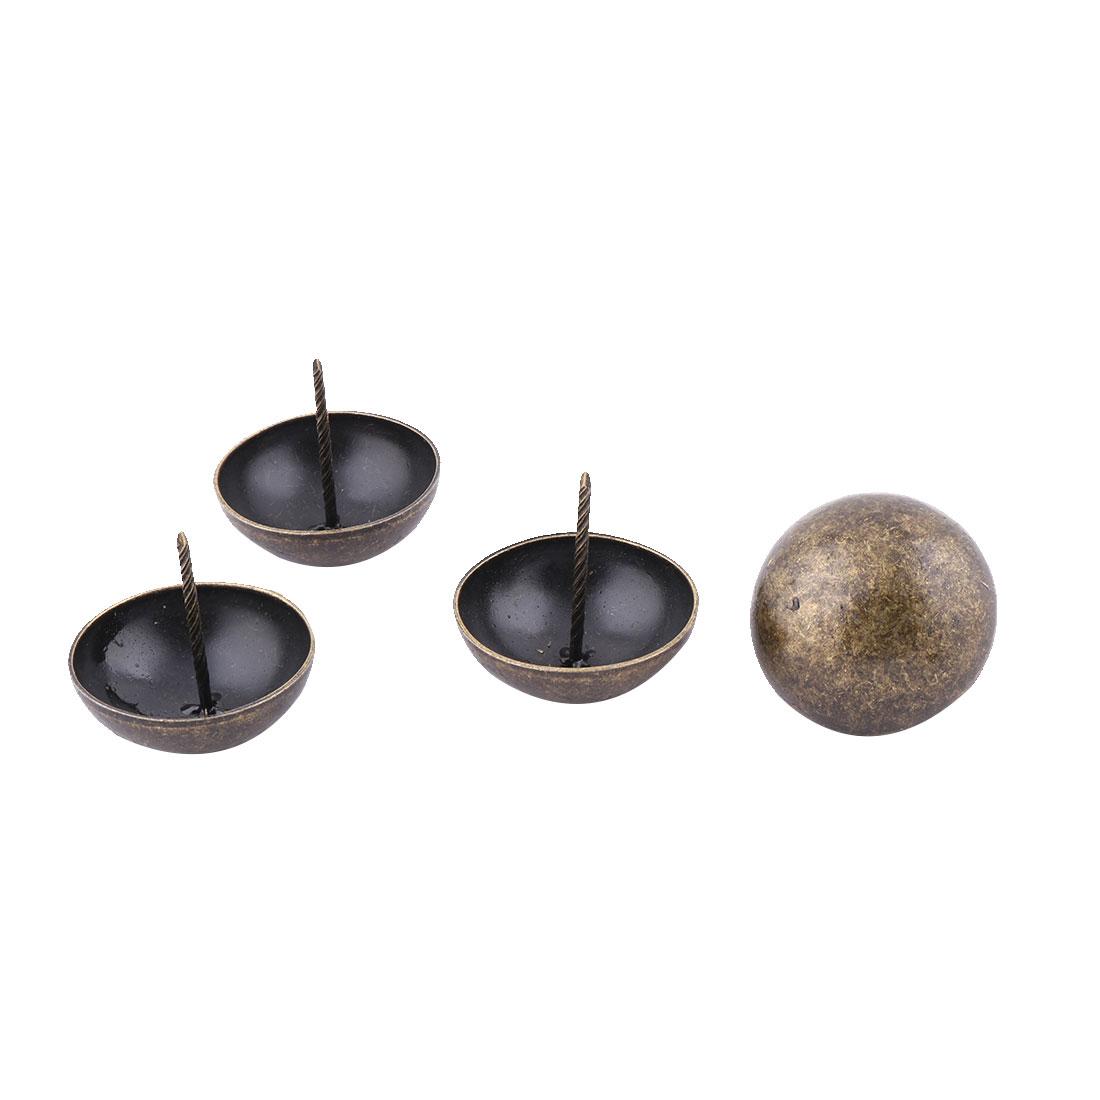 Home Furniture Metal Round Cap Tack Nail Decor Pushpin Bronze Tone 50 x 50mm 4pcs